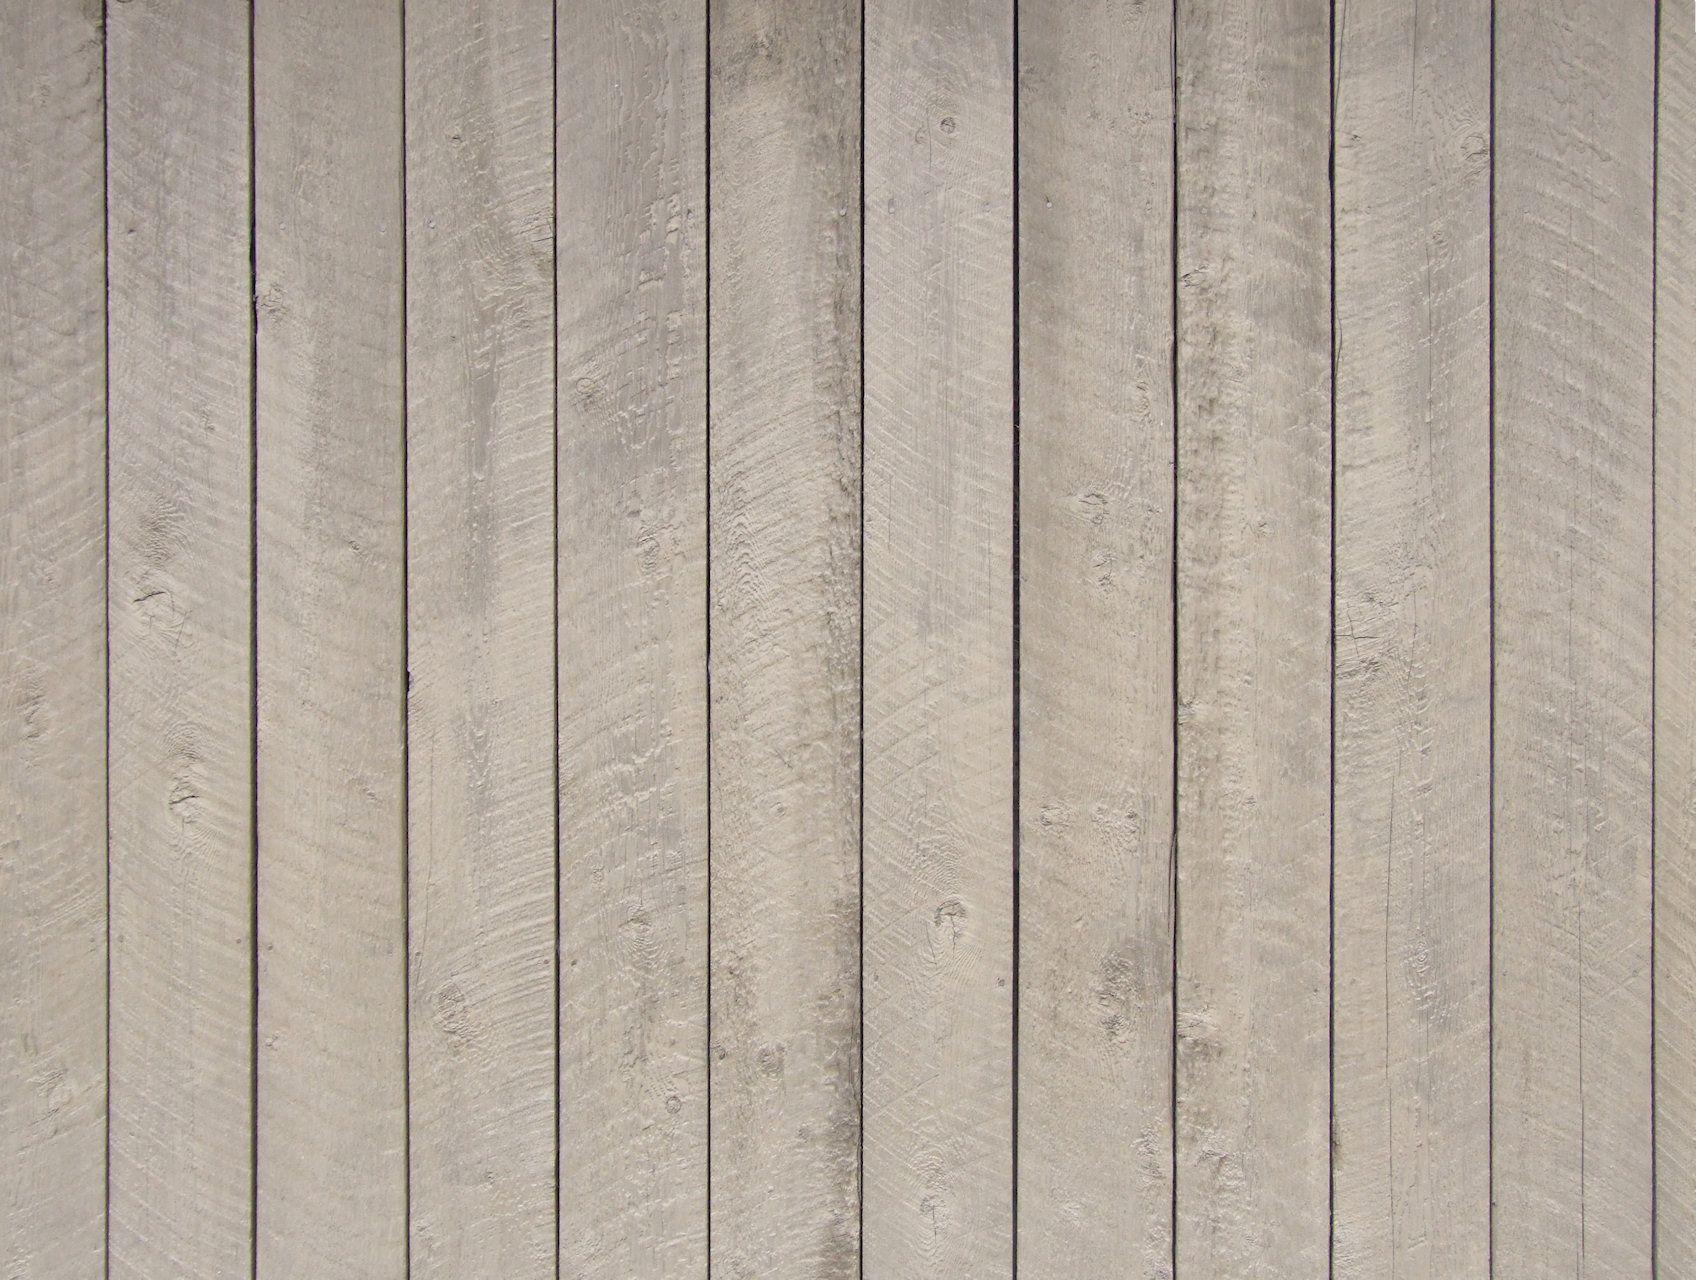 white wood floor texture Google Search Texturas, Tudo